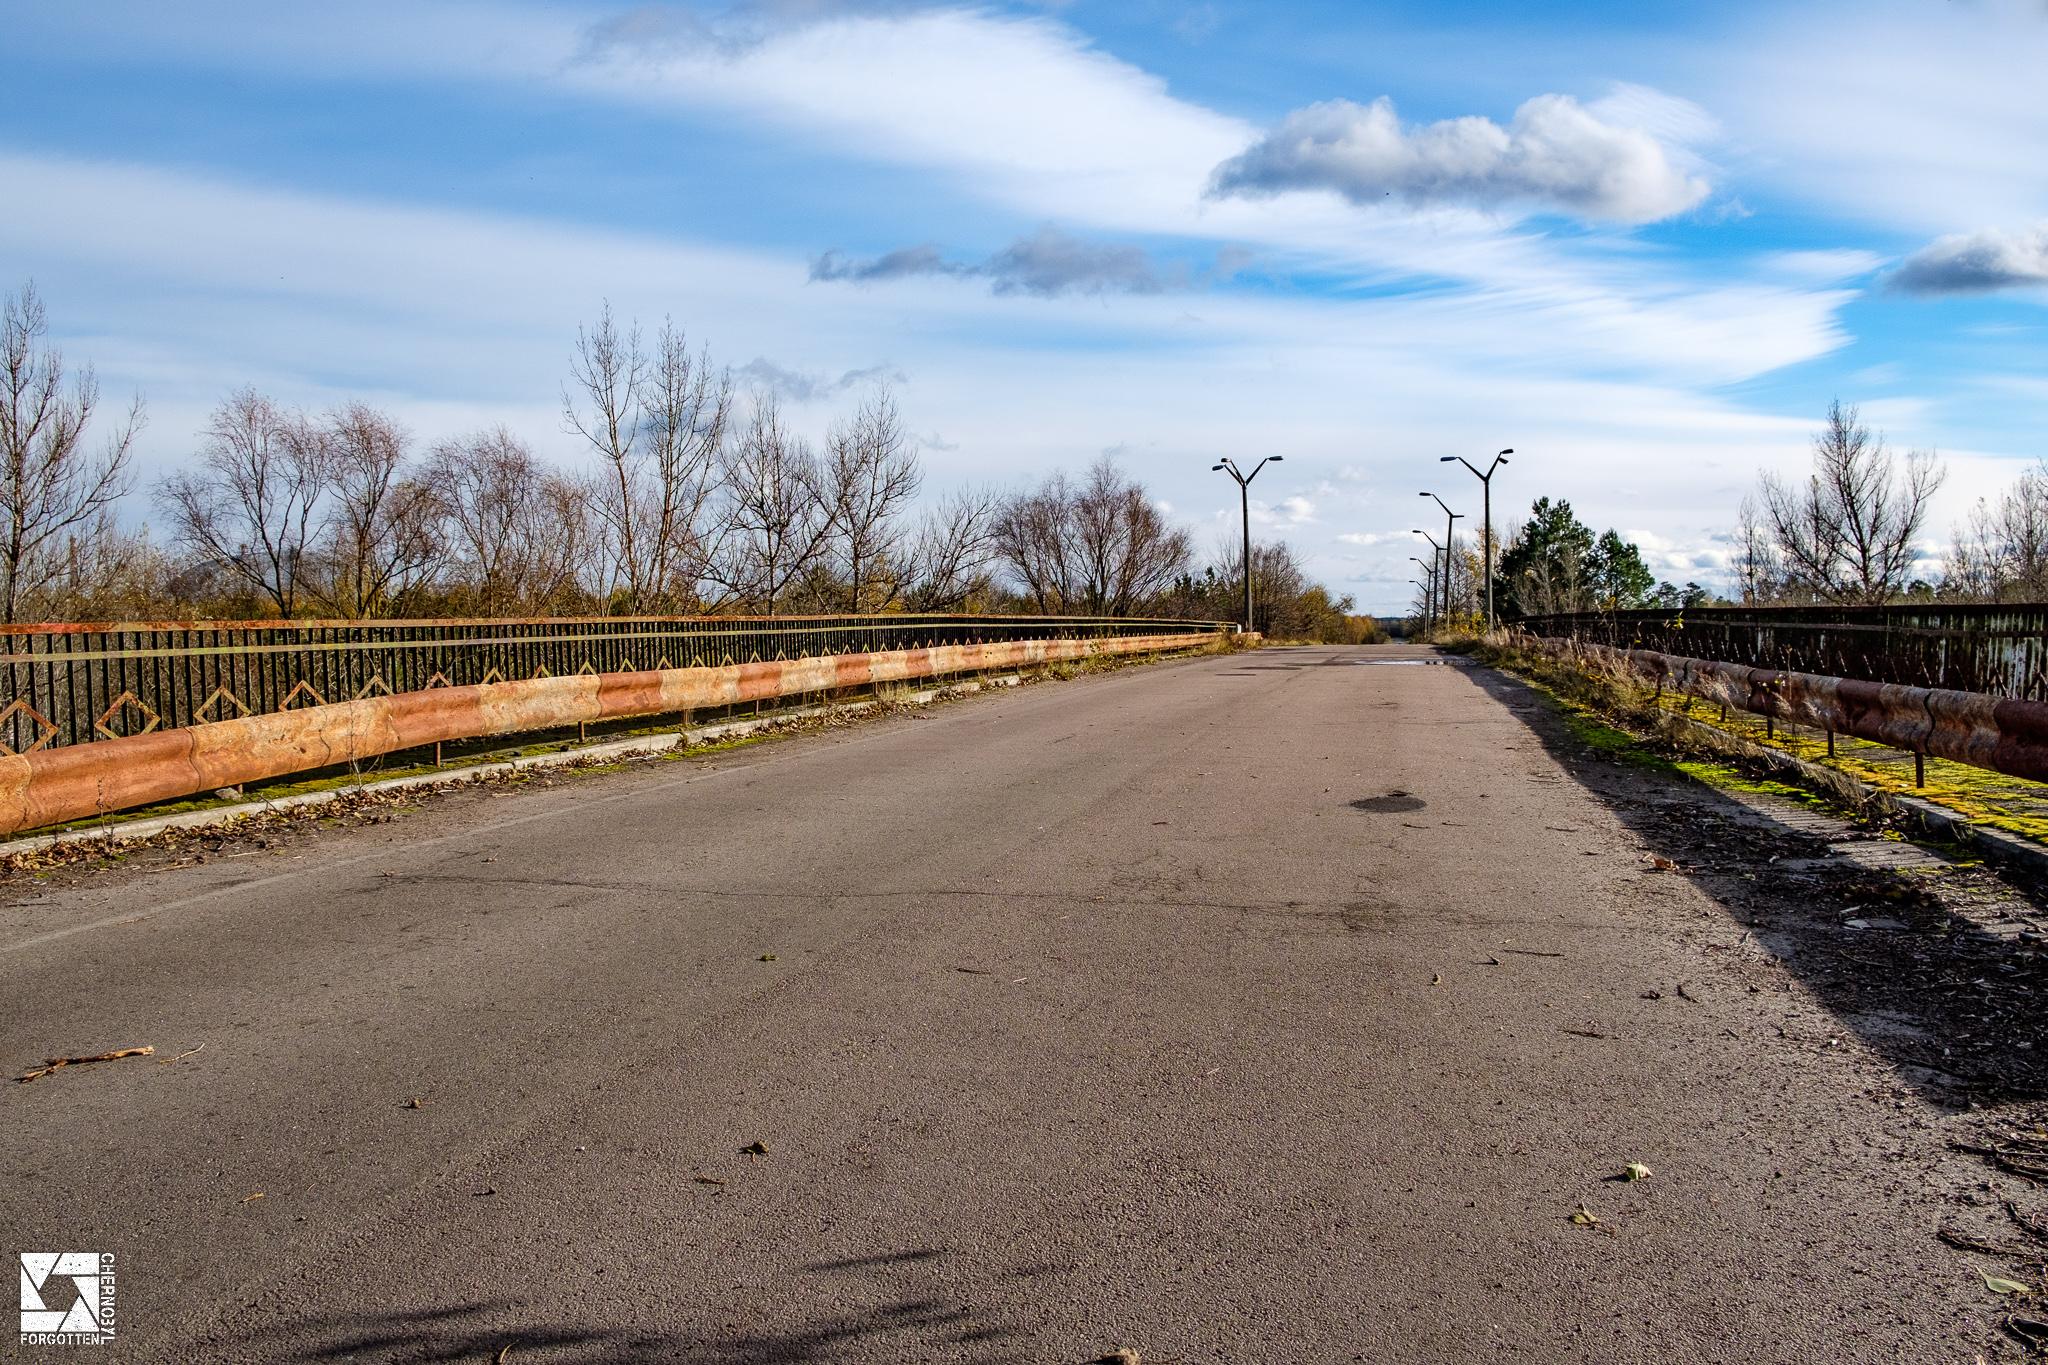 Bridge of Death between Chernobyl and Pripyat